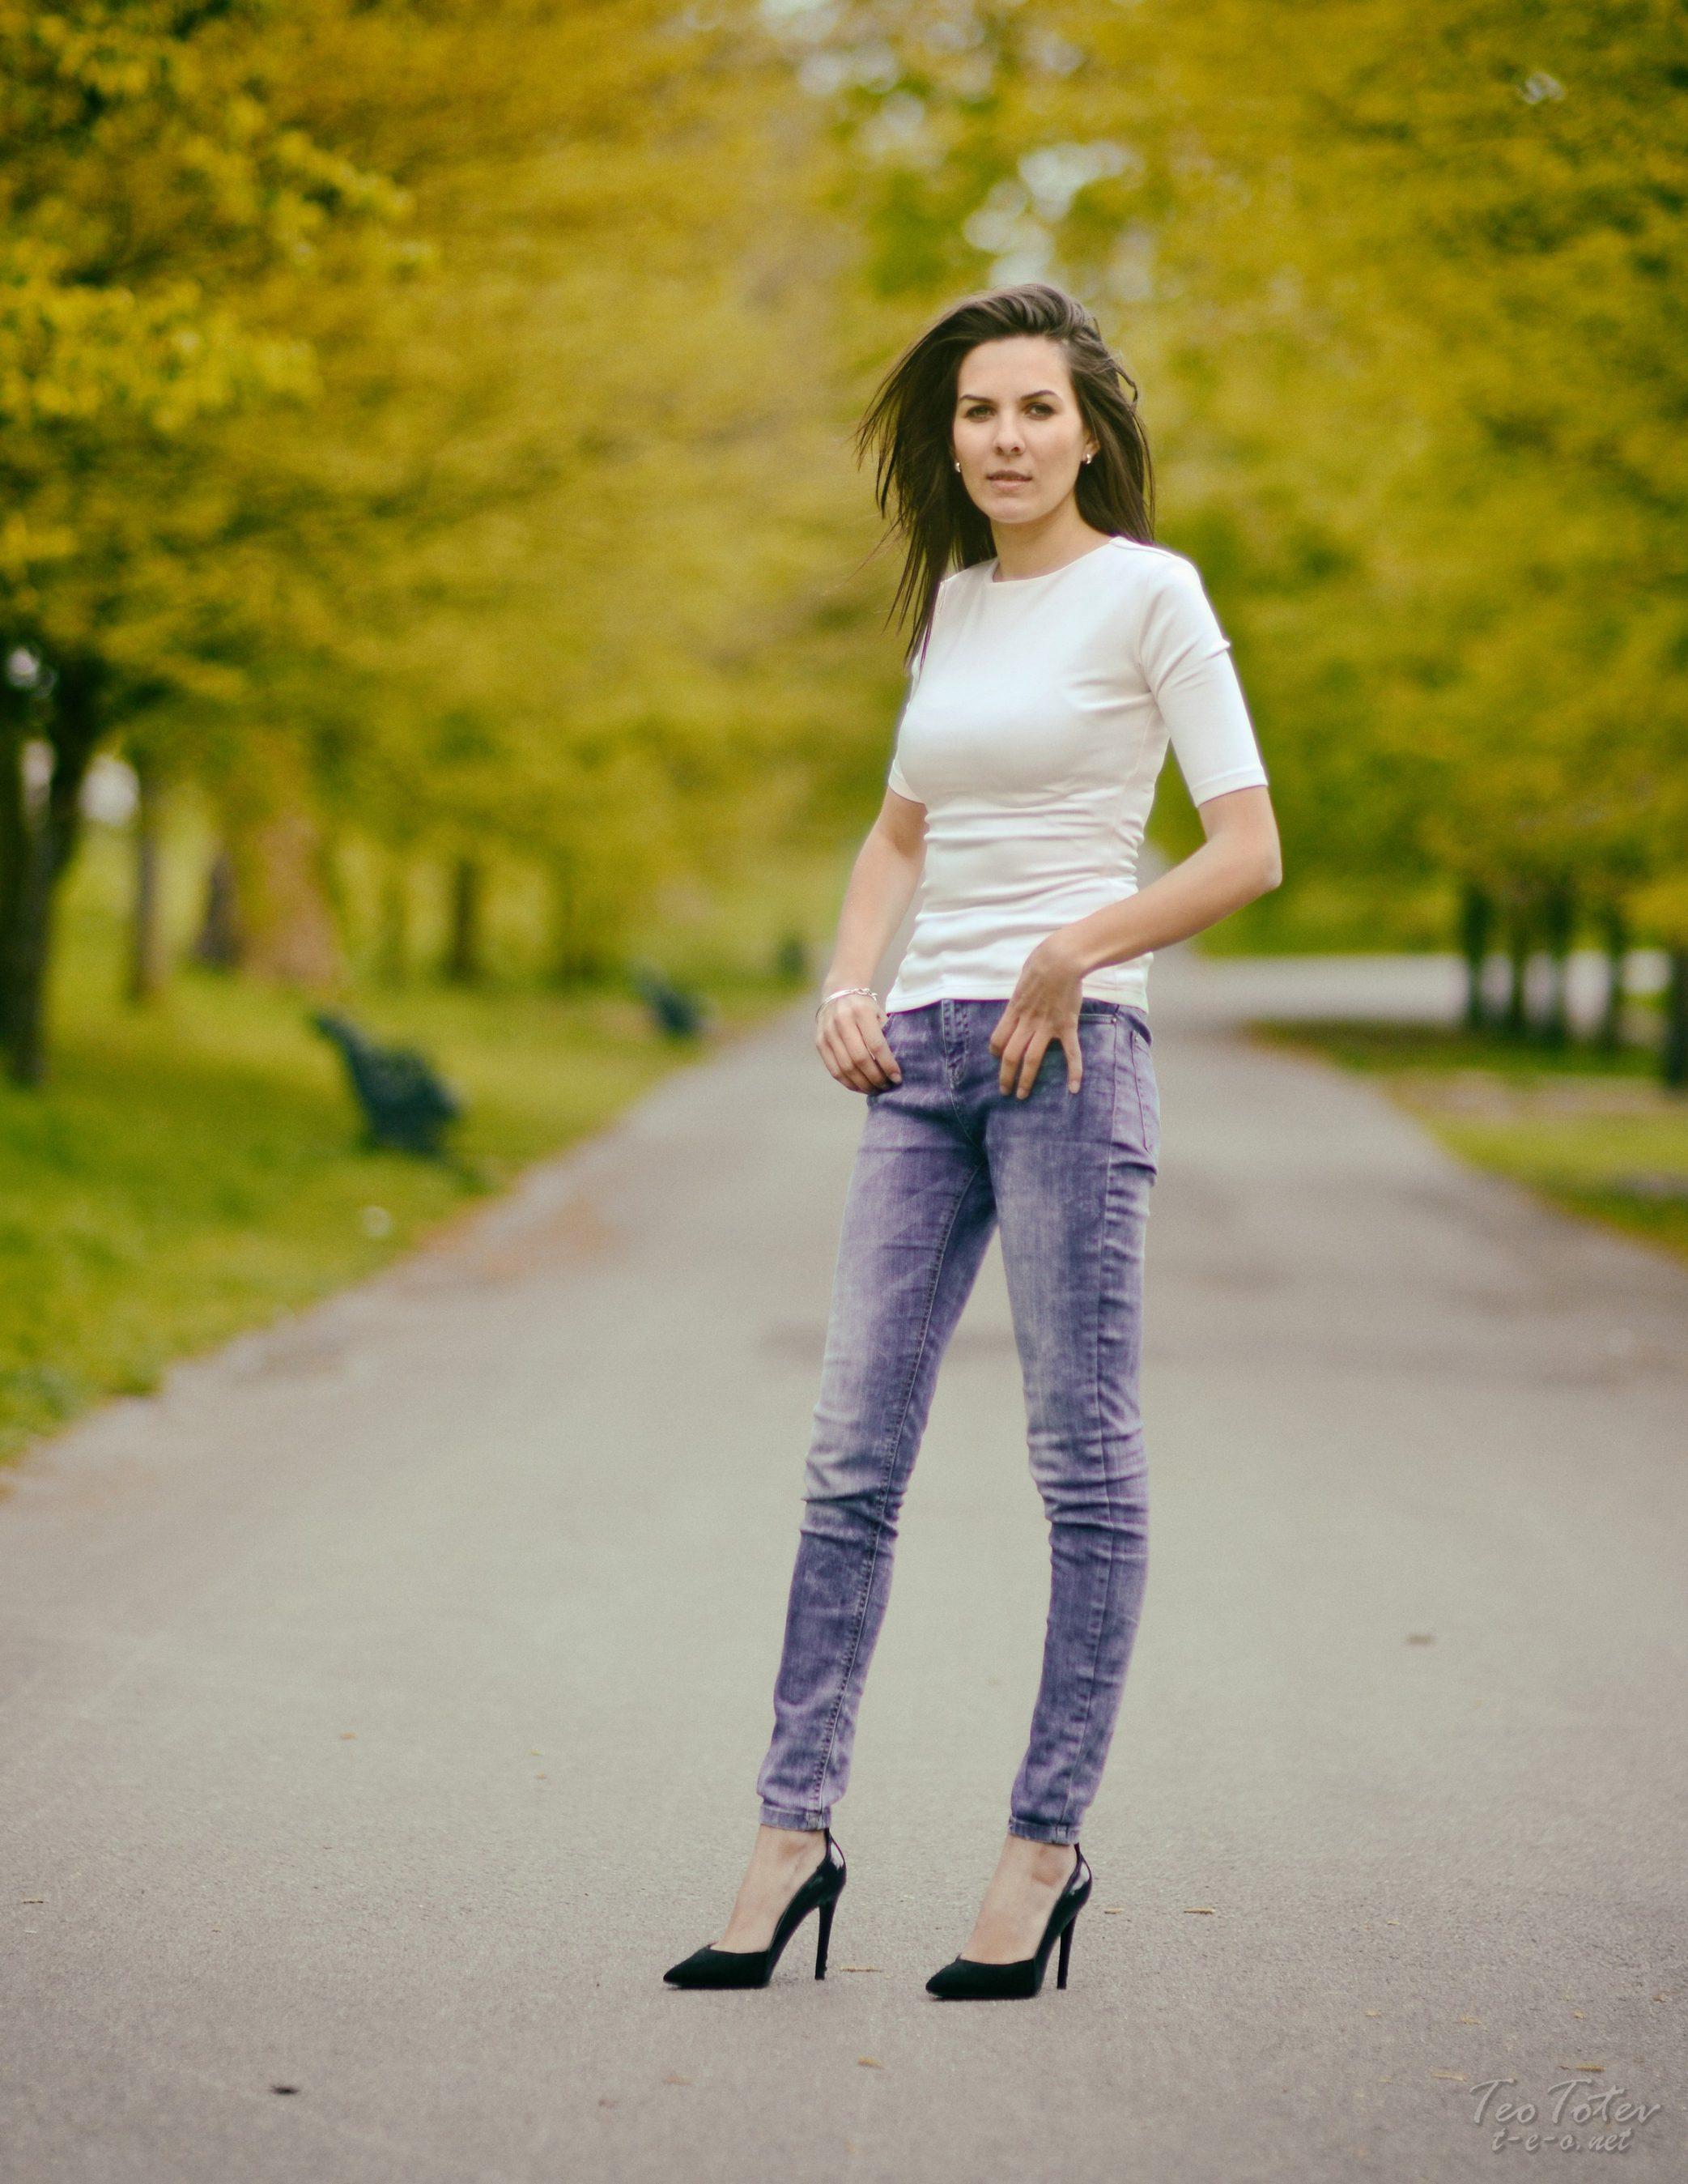 Long Legs girl in stilettos